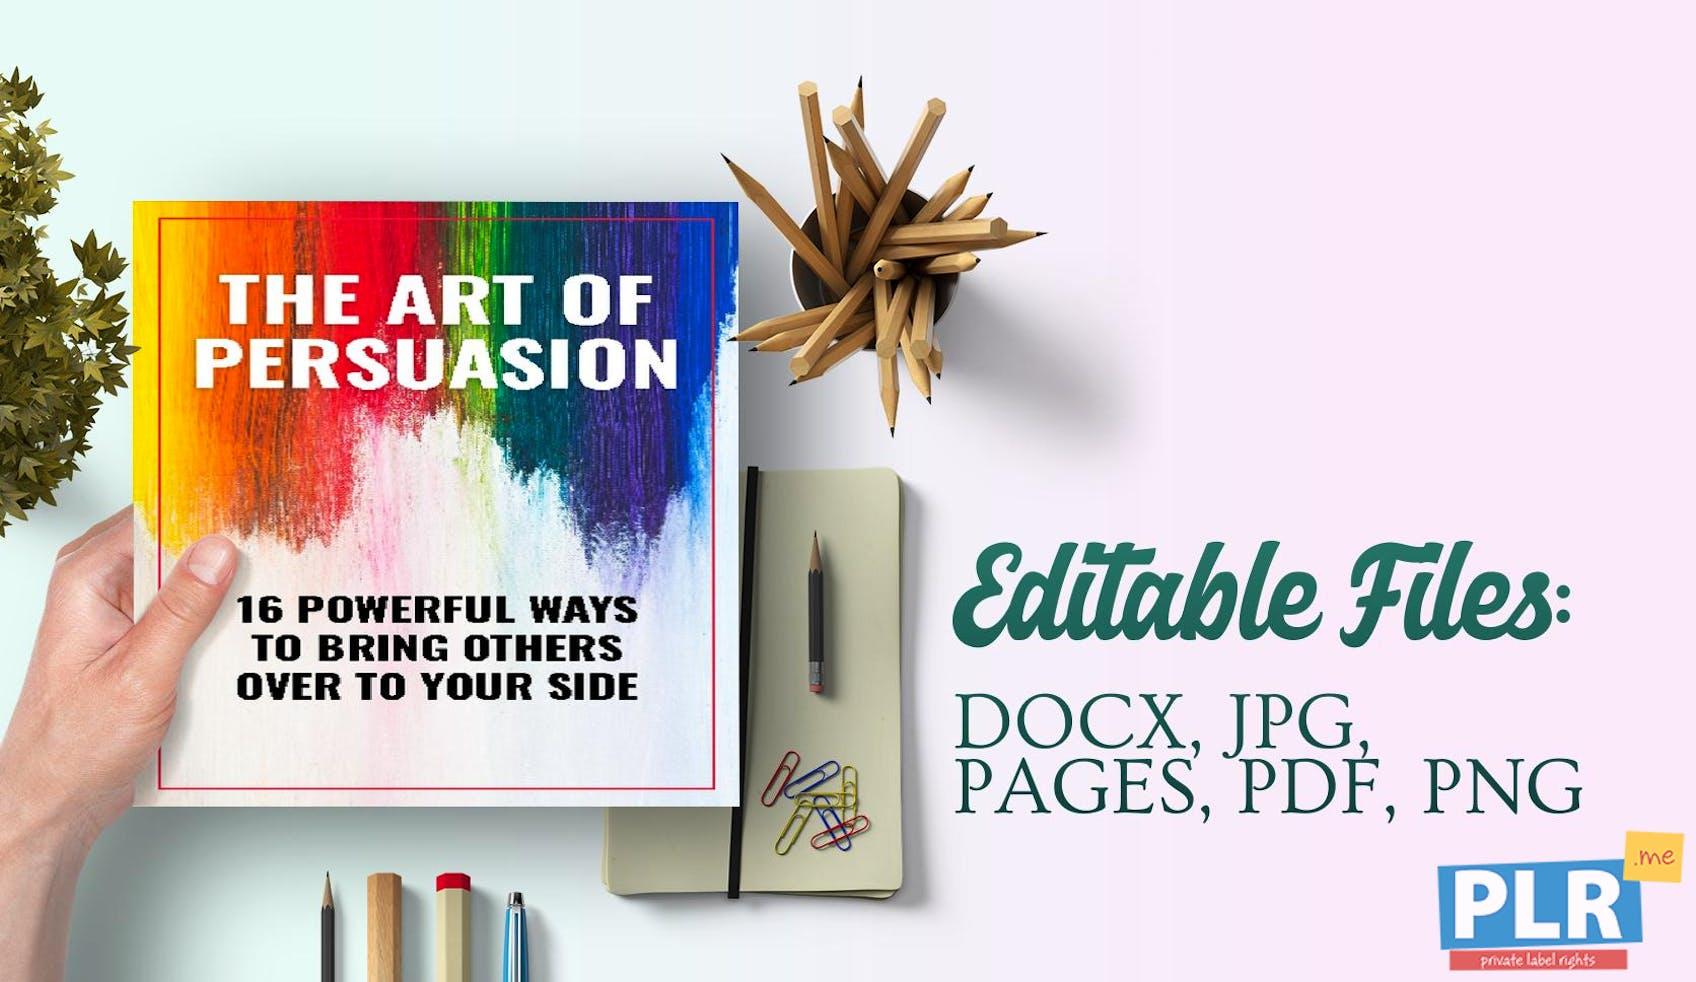 The Art Of Persuasion